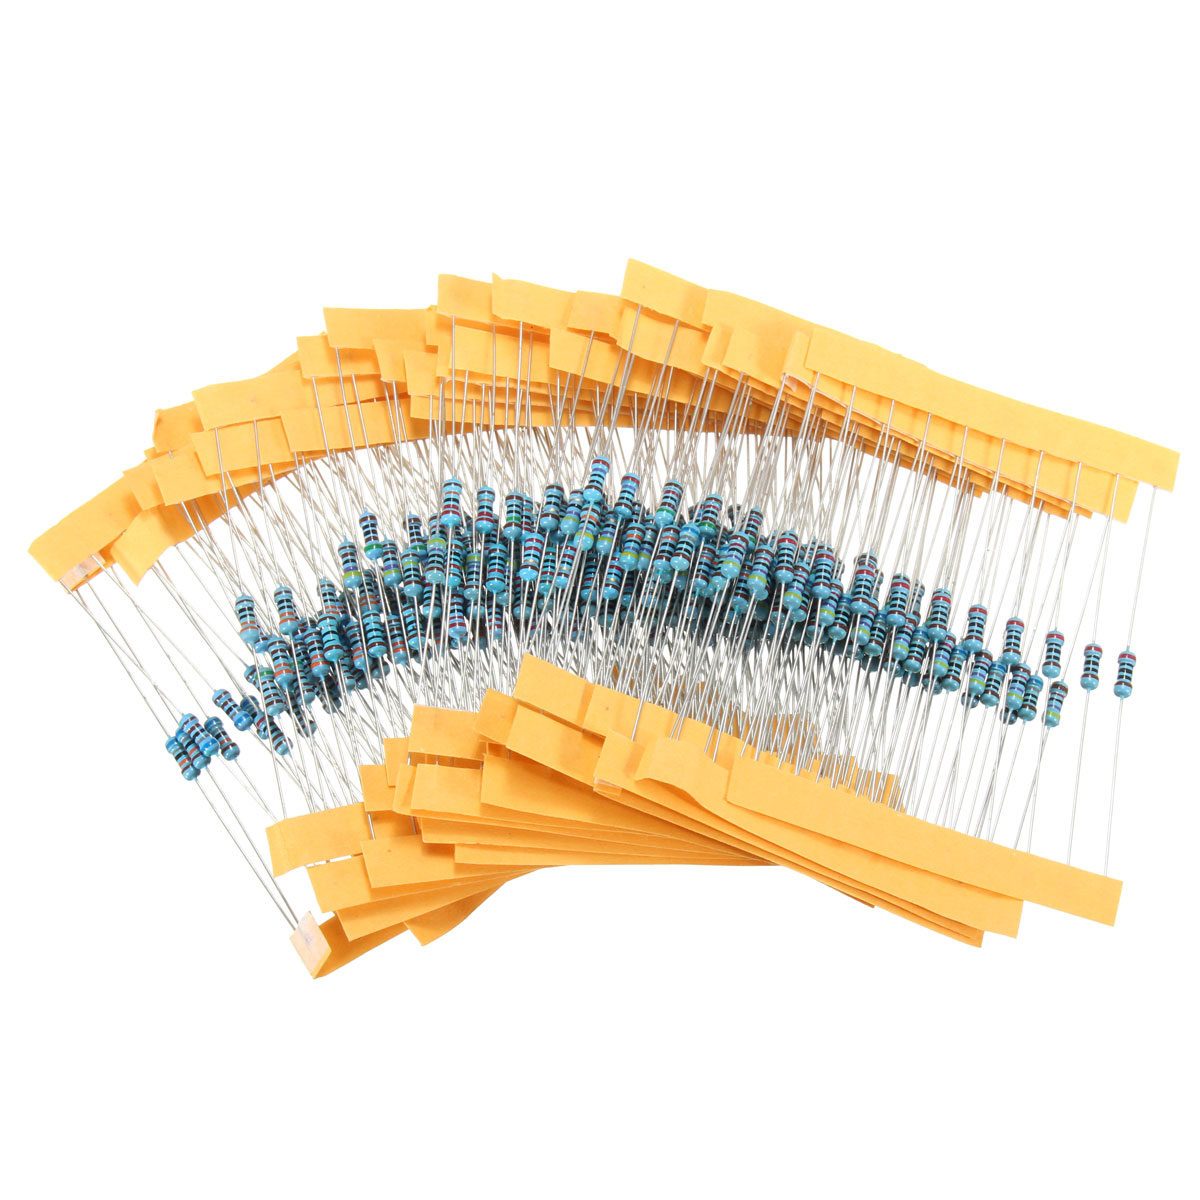 excelente professiona resistores de metal pacotes 10